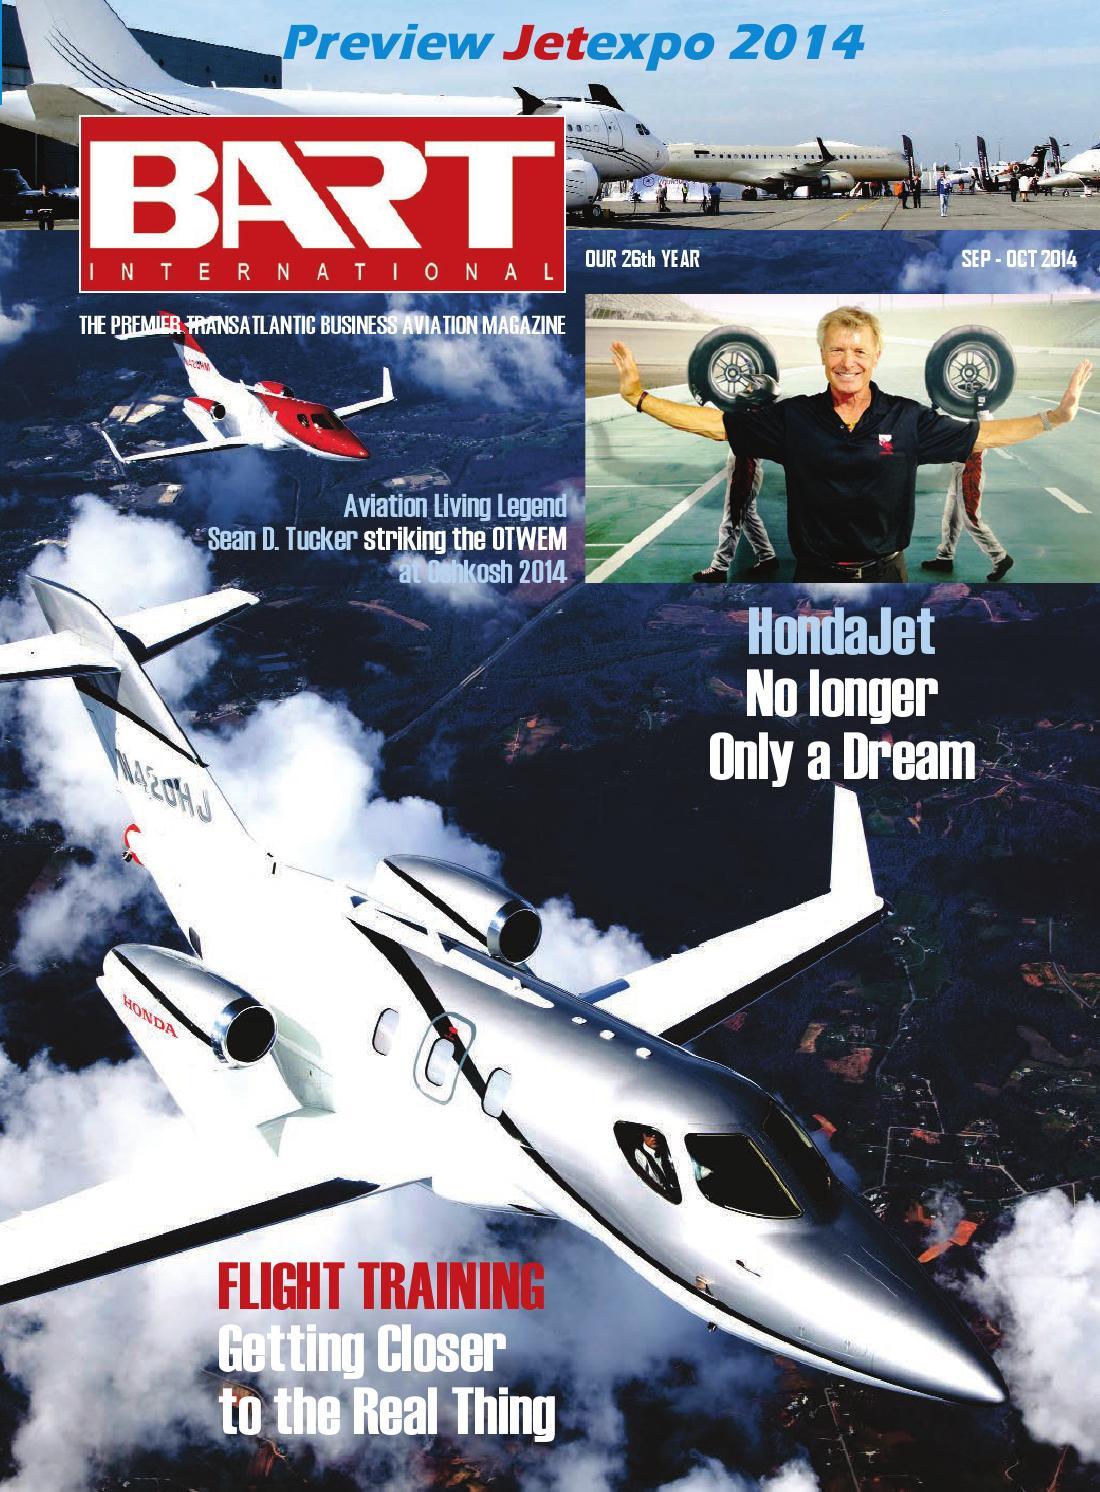 Bartintl152 By Bart International Issuu Pw4000 Field Wire Harness Repair